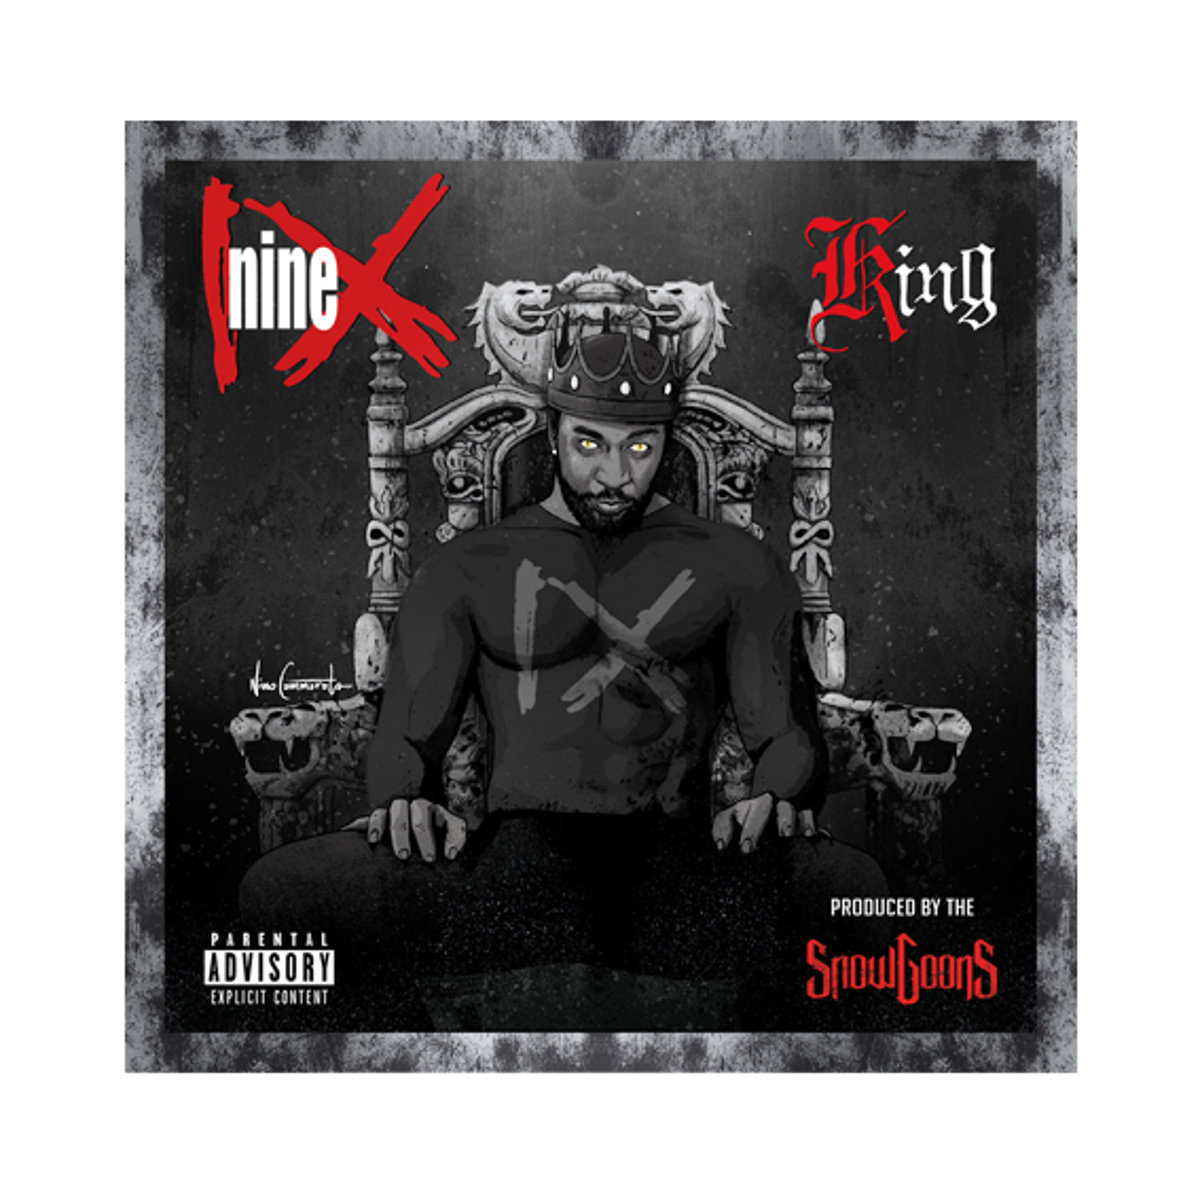 free mp3 hip hop music download sites